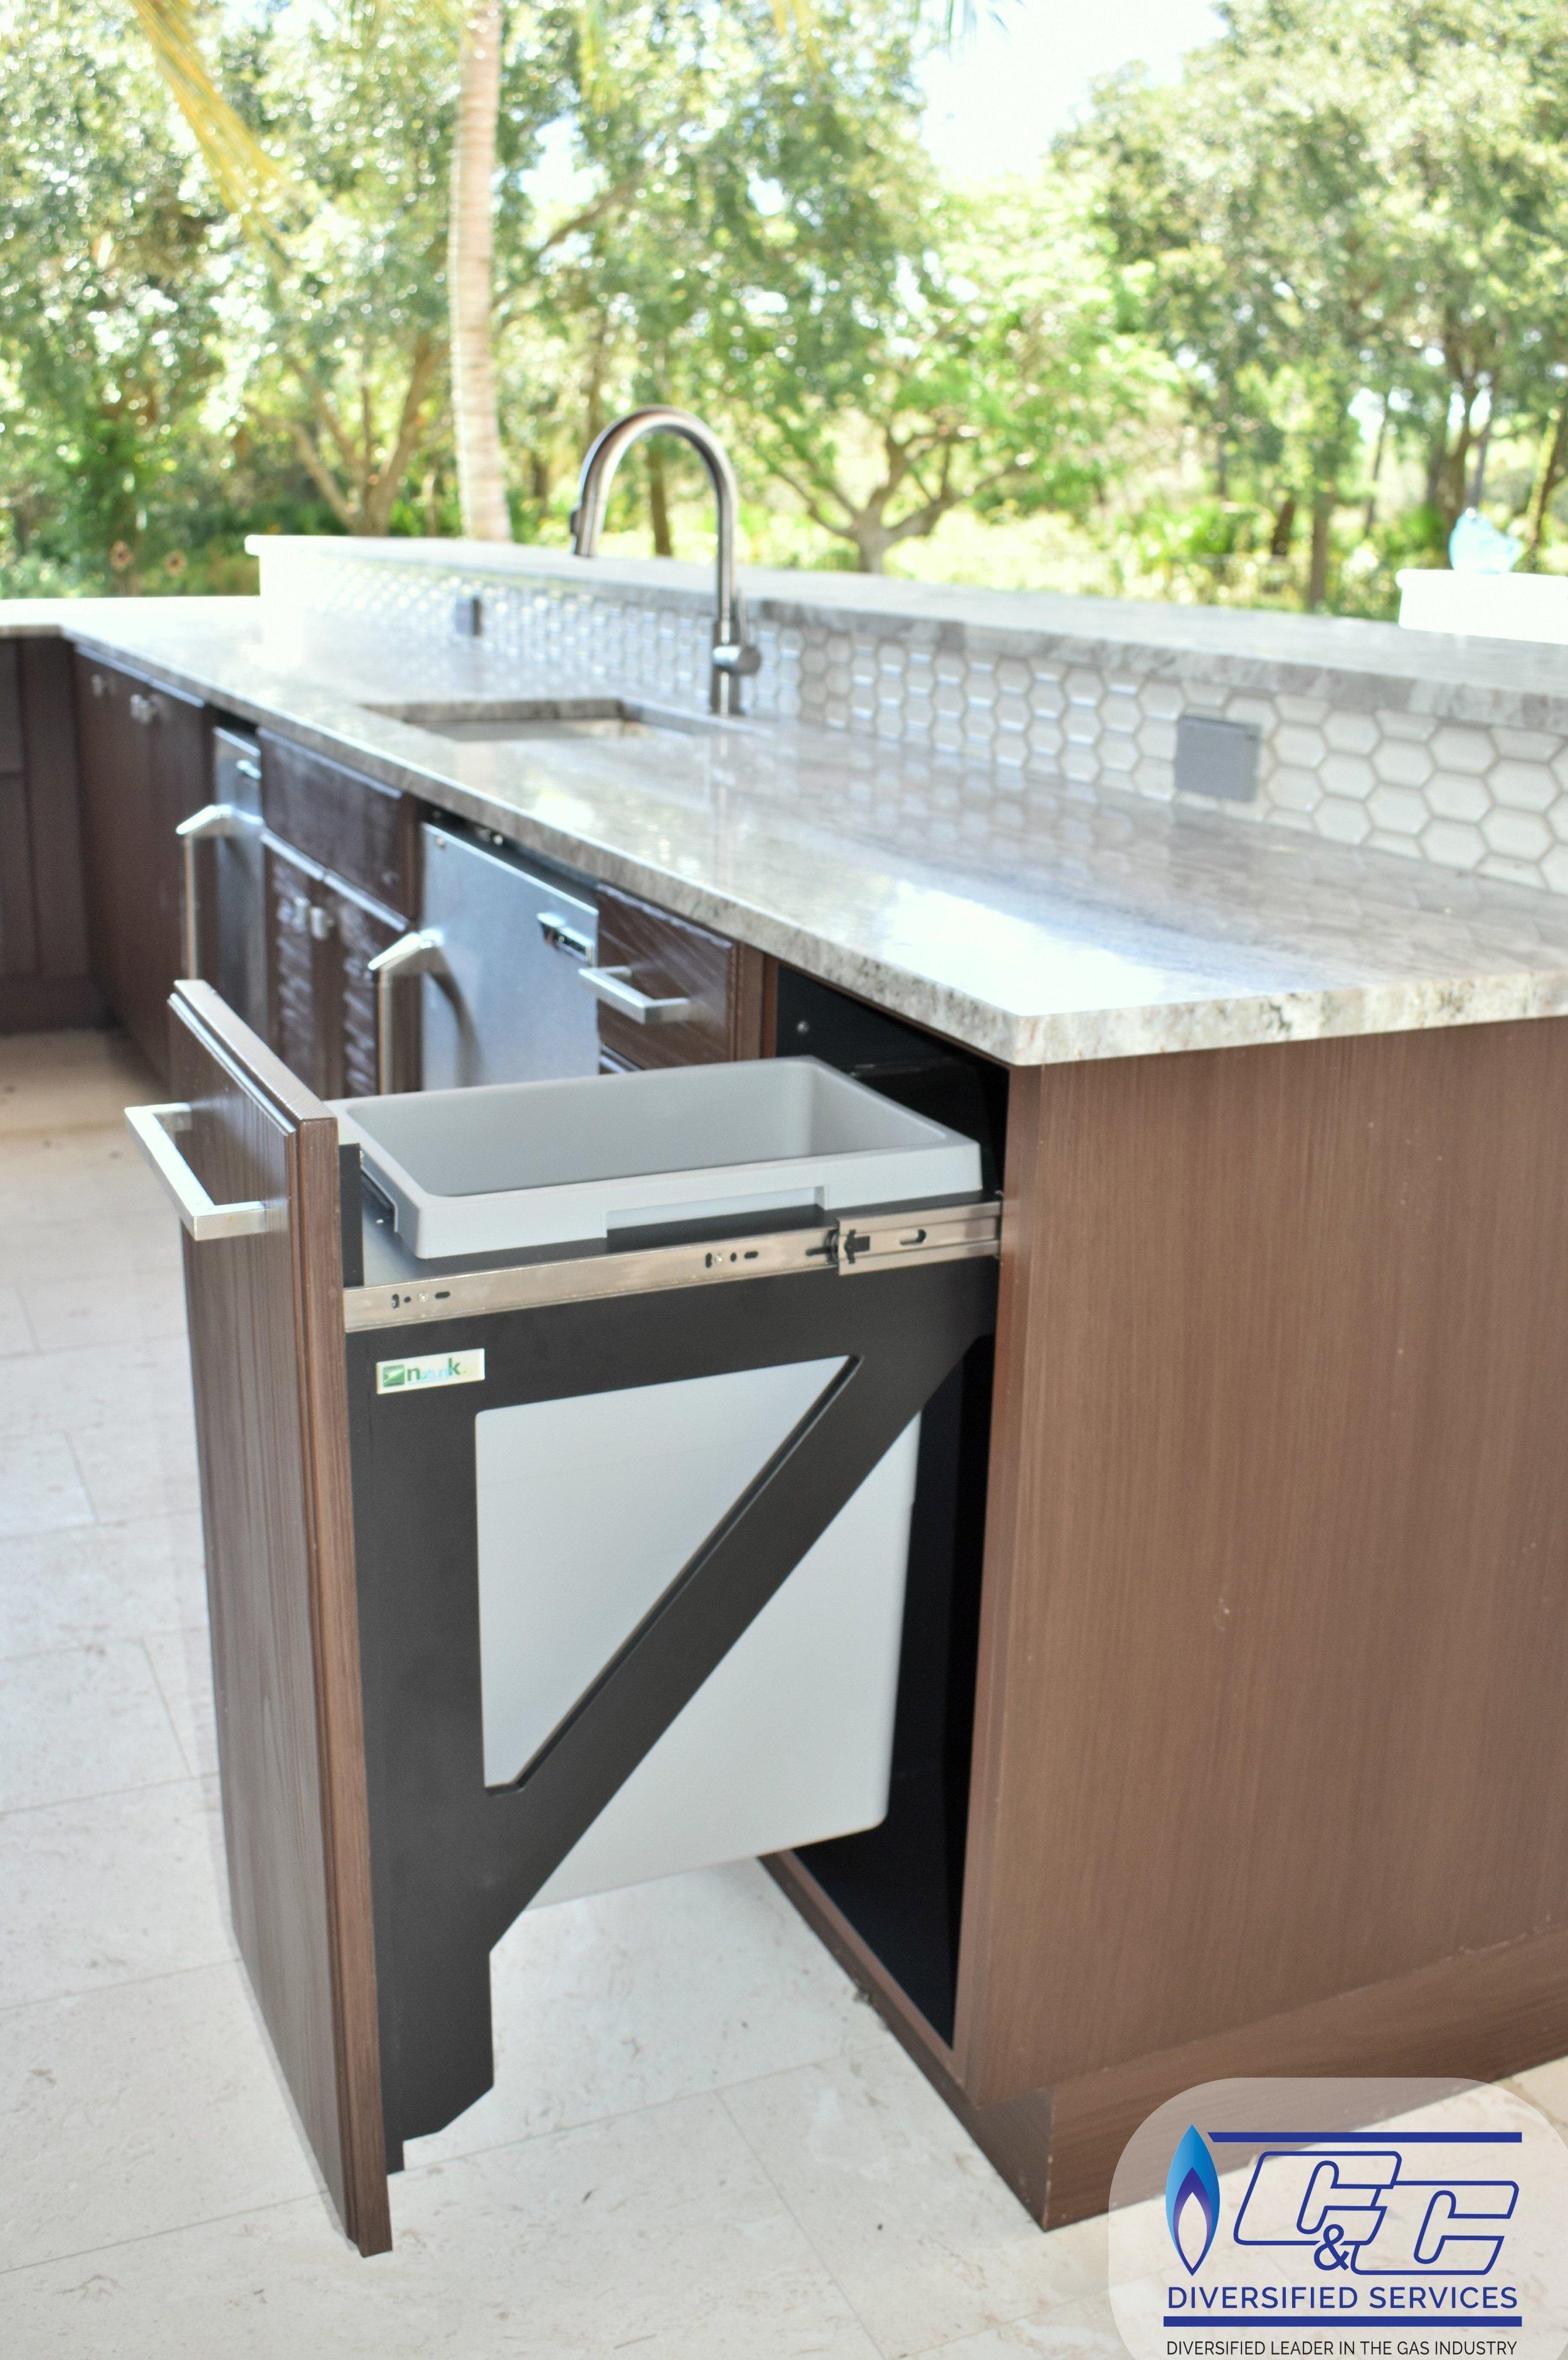 NatureKast Weatherproof Cabinetry - Waste Bin Cabinet